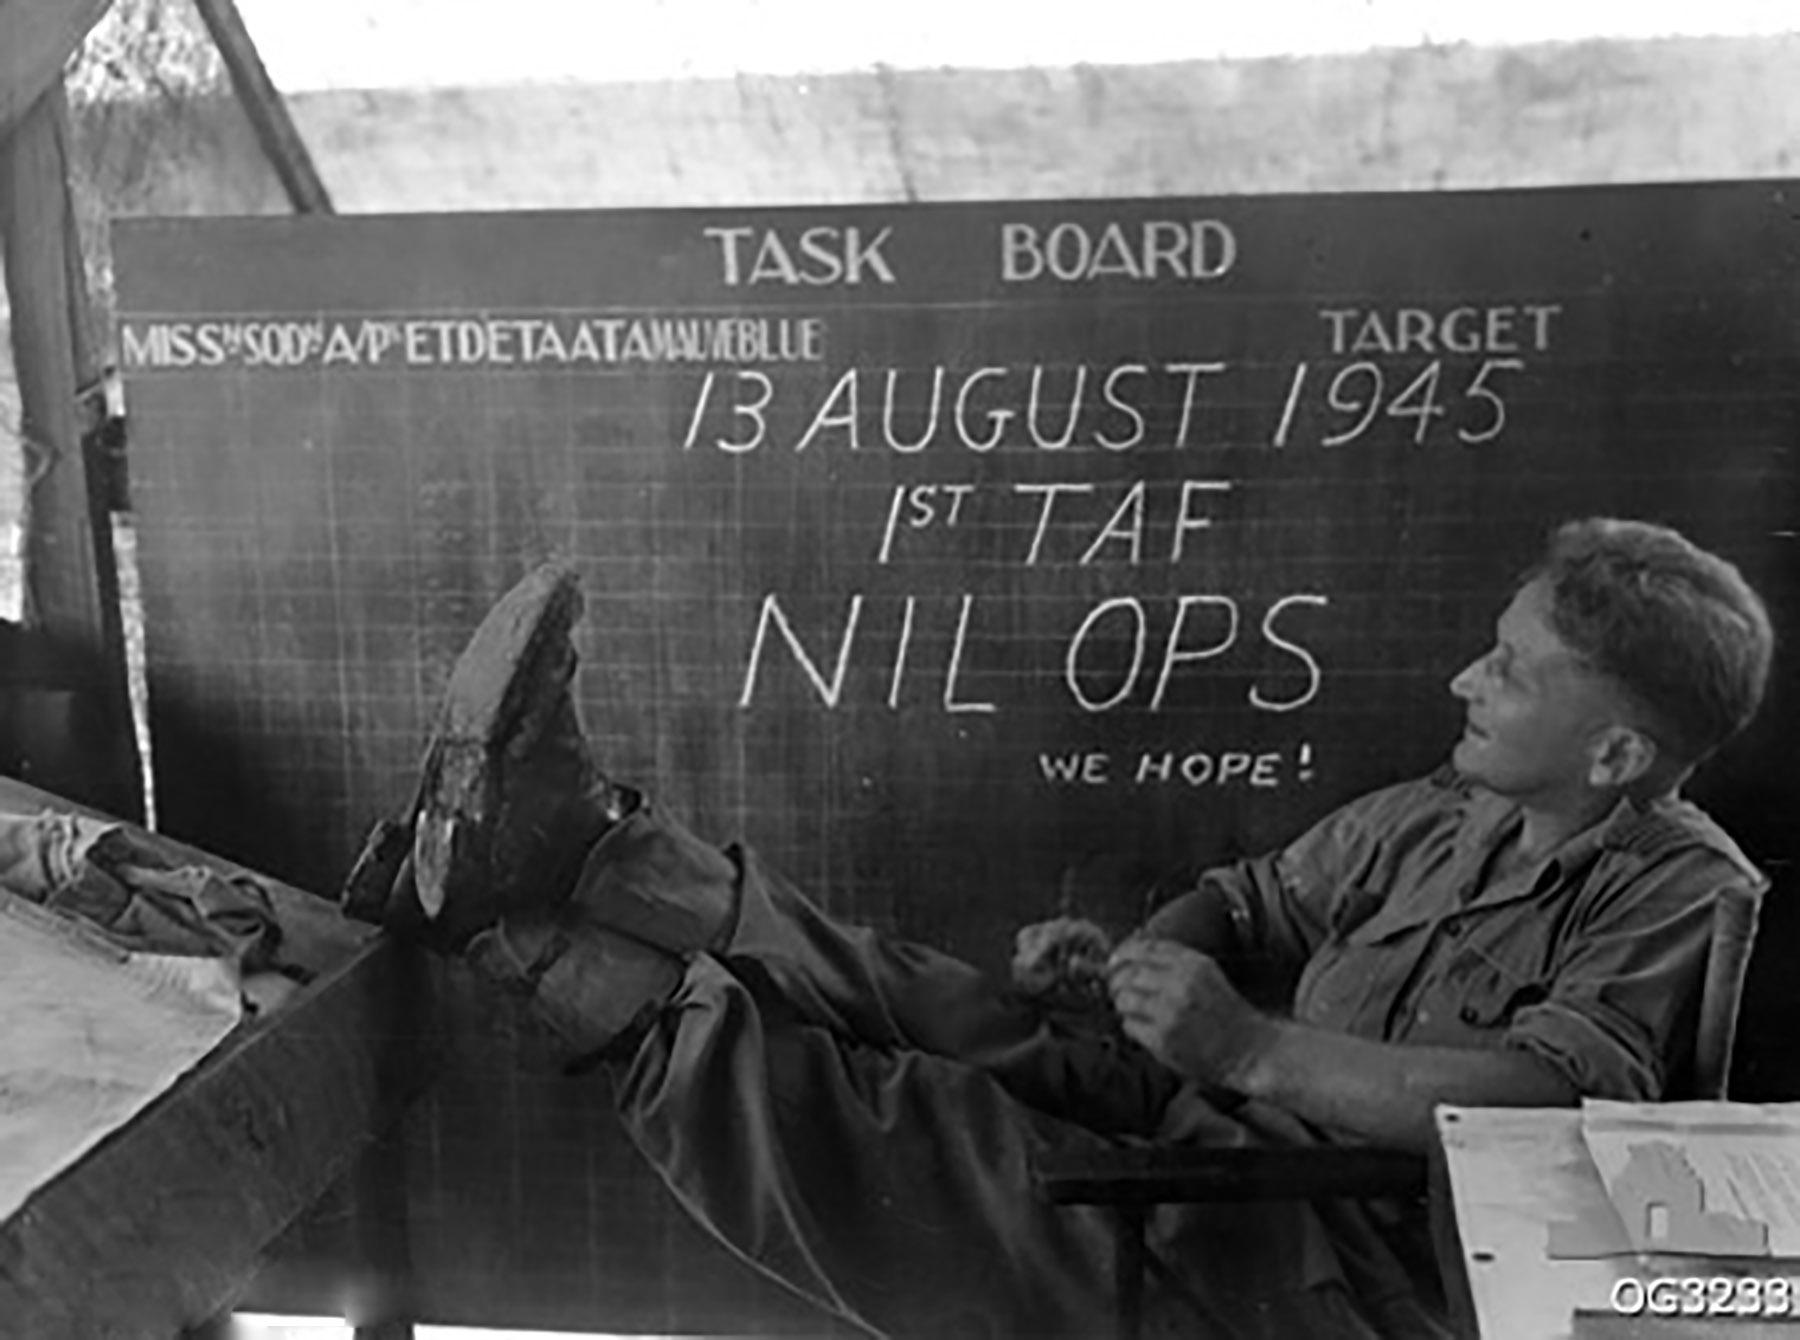 Aircrew RAAF 1TAC Nil ops (AWM OG3233)